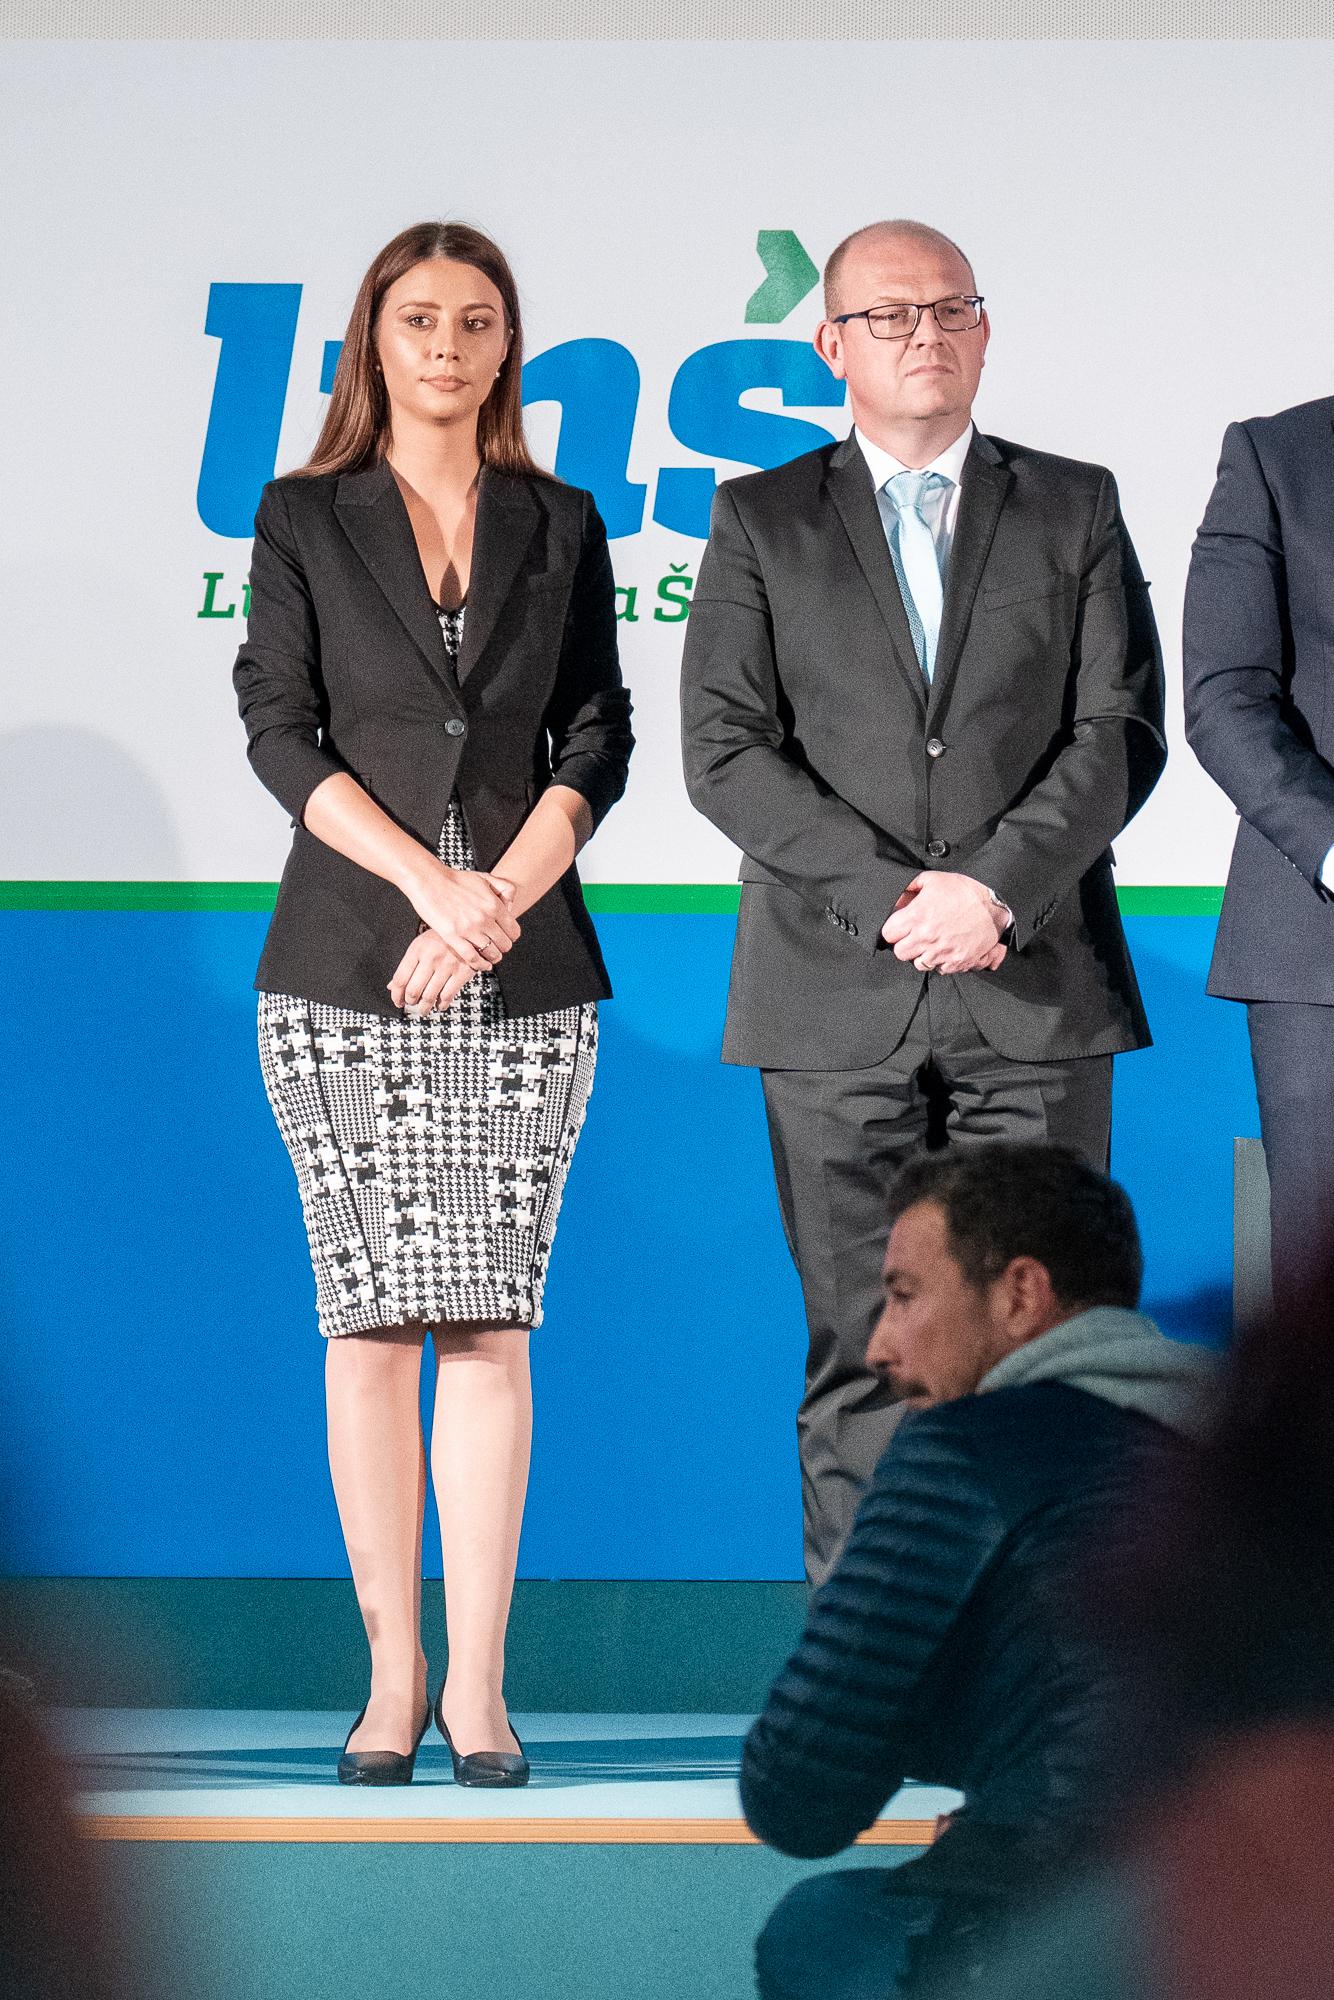 Irena Joveva and dr. Klemen Grošelj on the stage on the Fifth Congress of Lista Marjana Šarca in Trbovlje